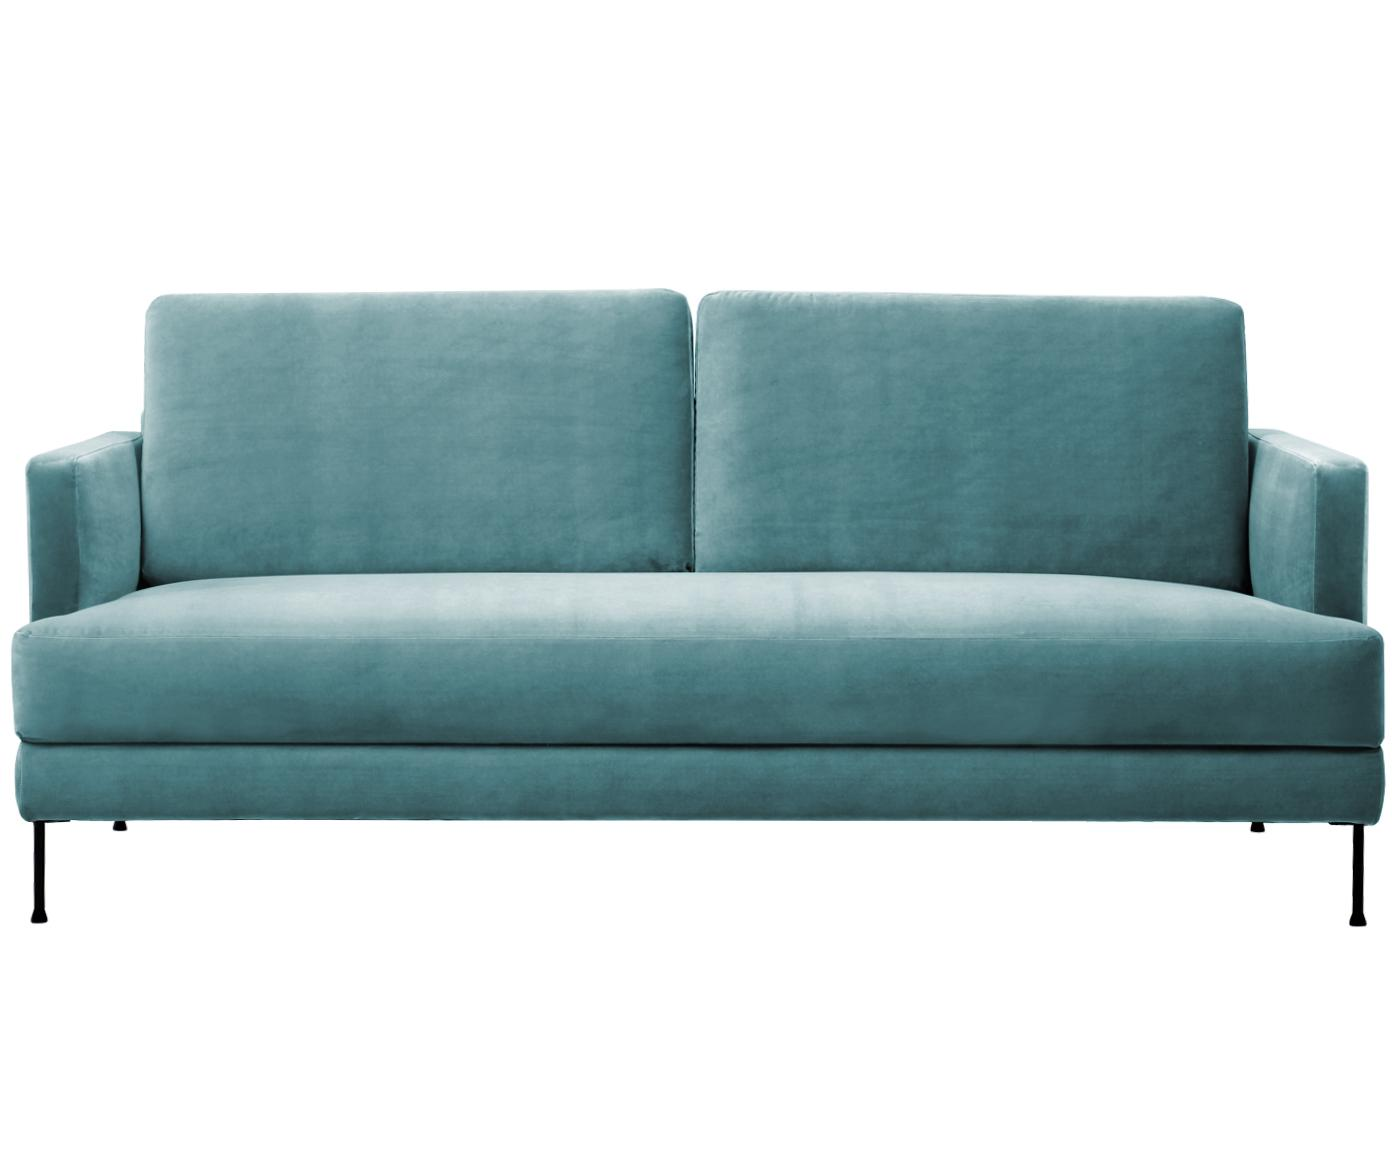 Fluwelen bank Fluente (3-zits), Bekleding: fluweel (hoogwaardig poly, Frame: massief grenenhout, Poten: gelakt metaal, Turquoise, B 197 x D 83 cm